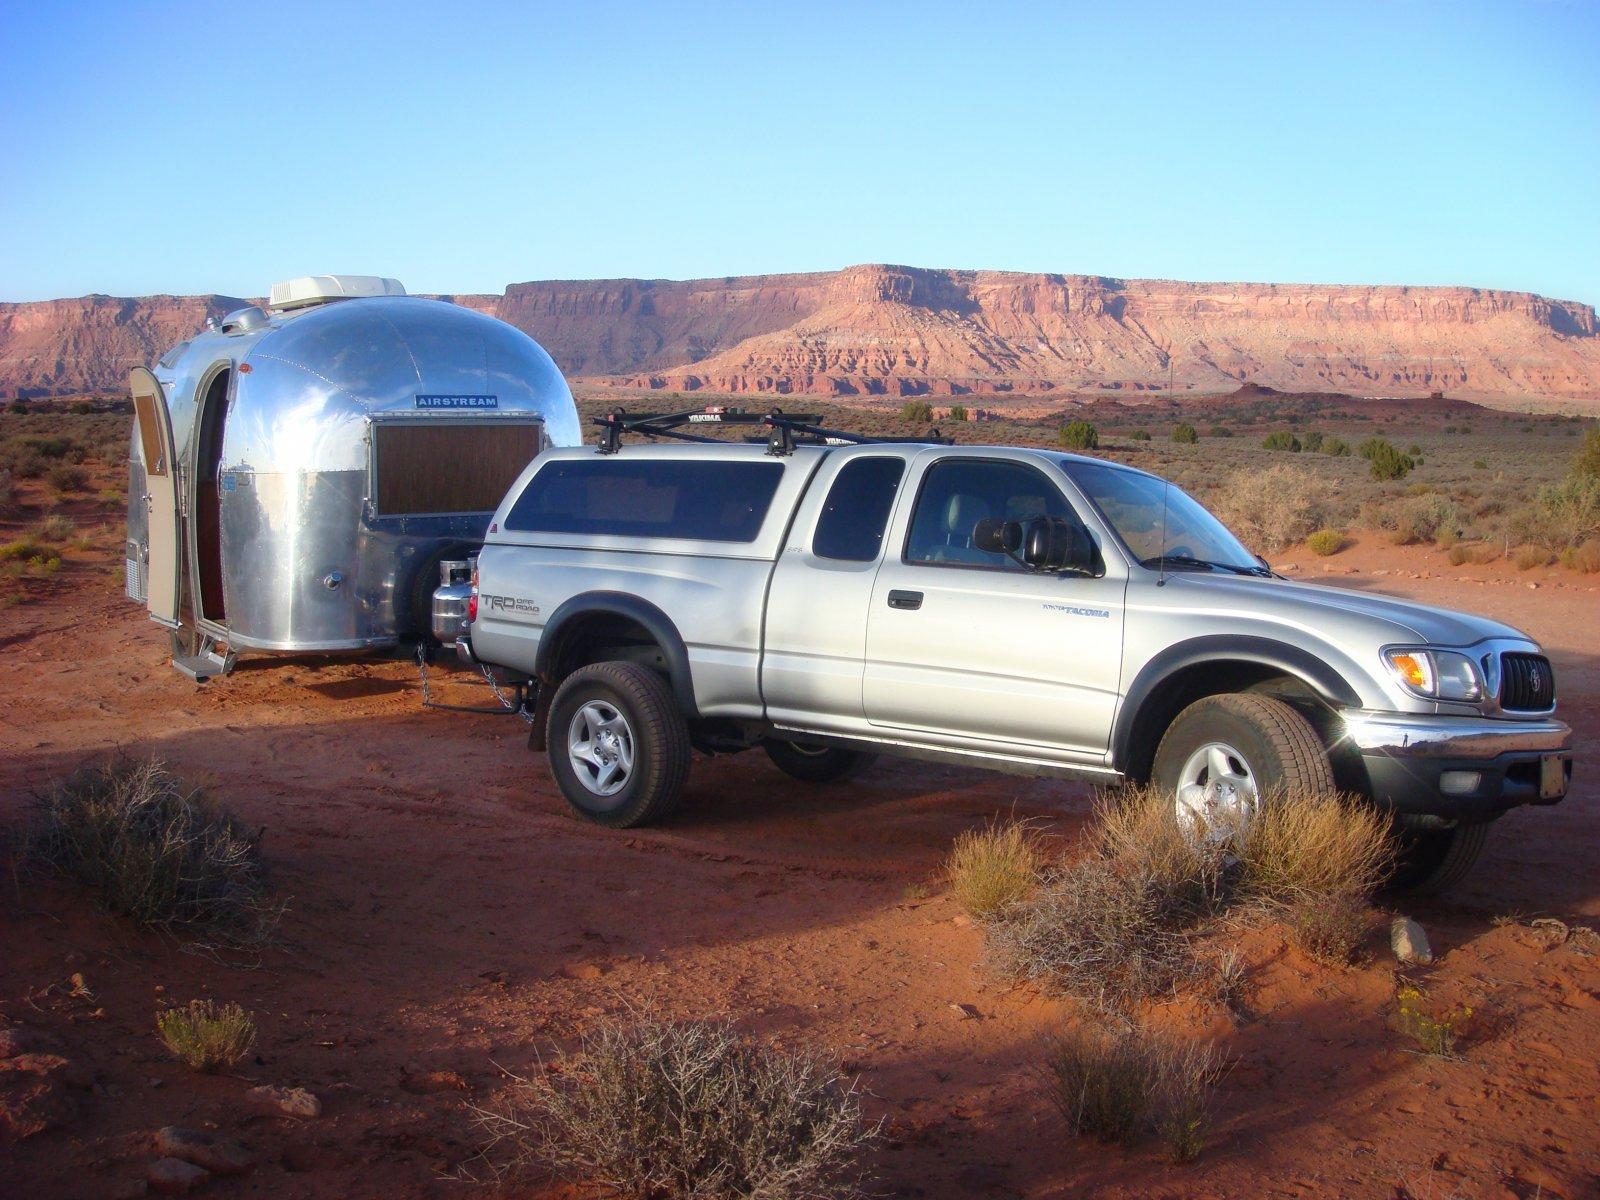 Click image for larger version  Name:Desert 3.jpg Views:131 Size:329.8 KB ID:183749